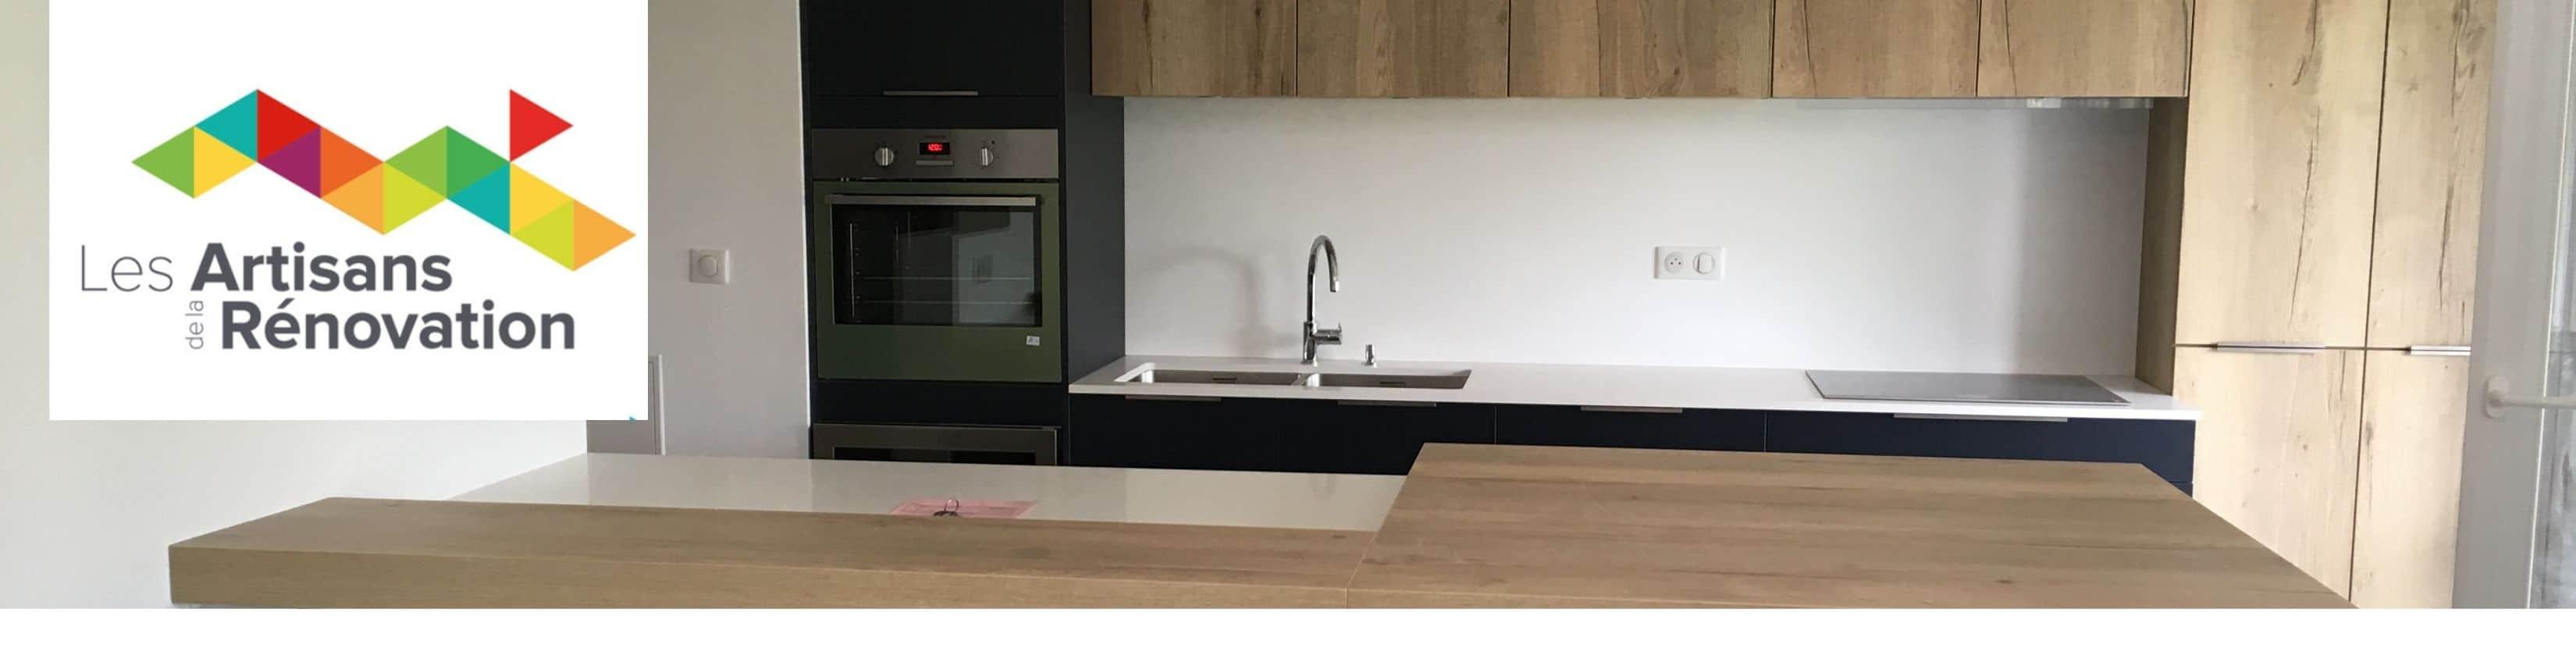 renovation cuisine avant apres